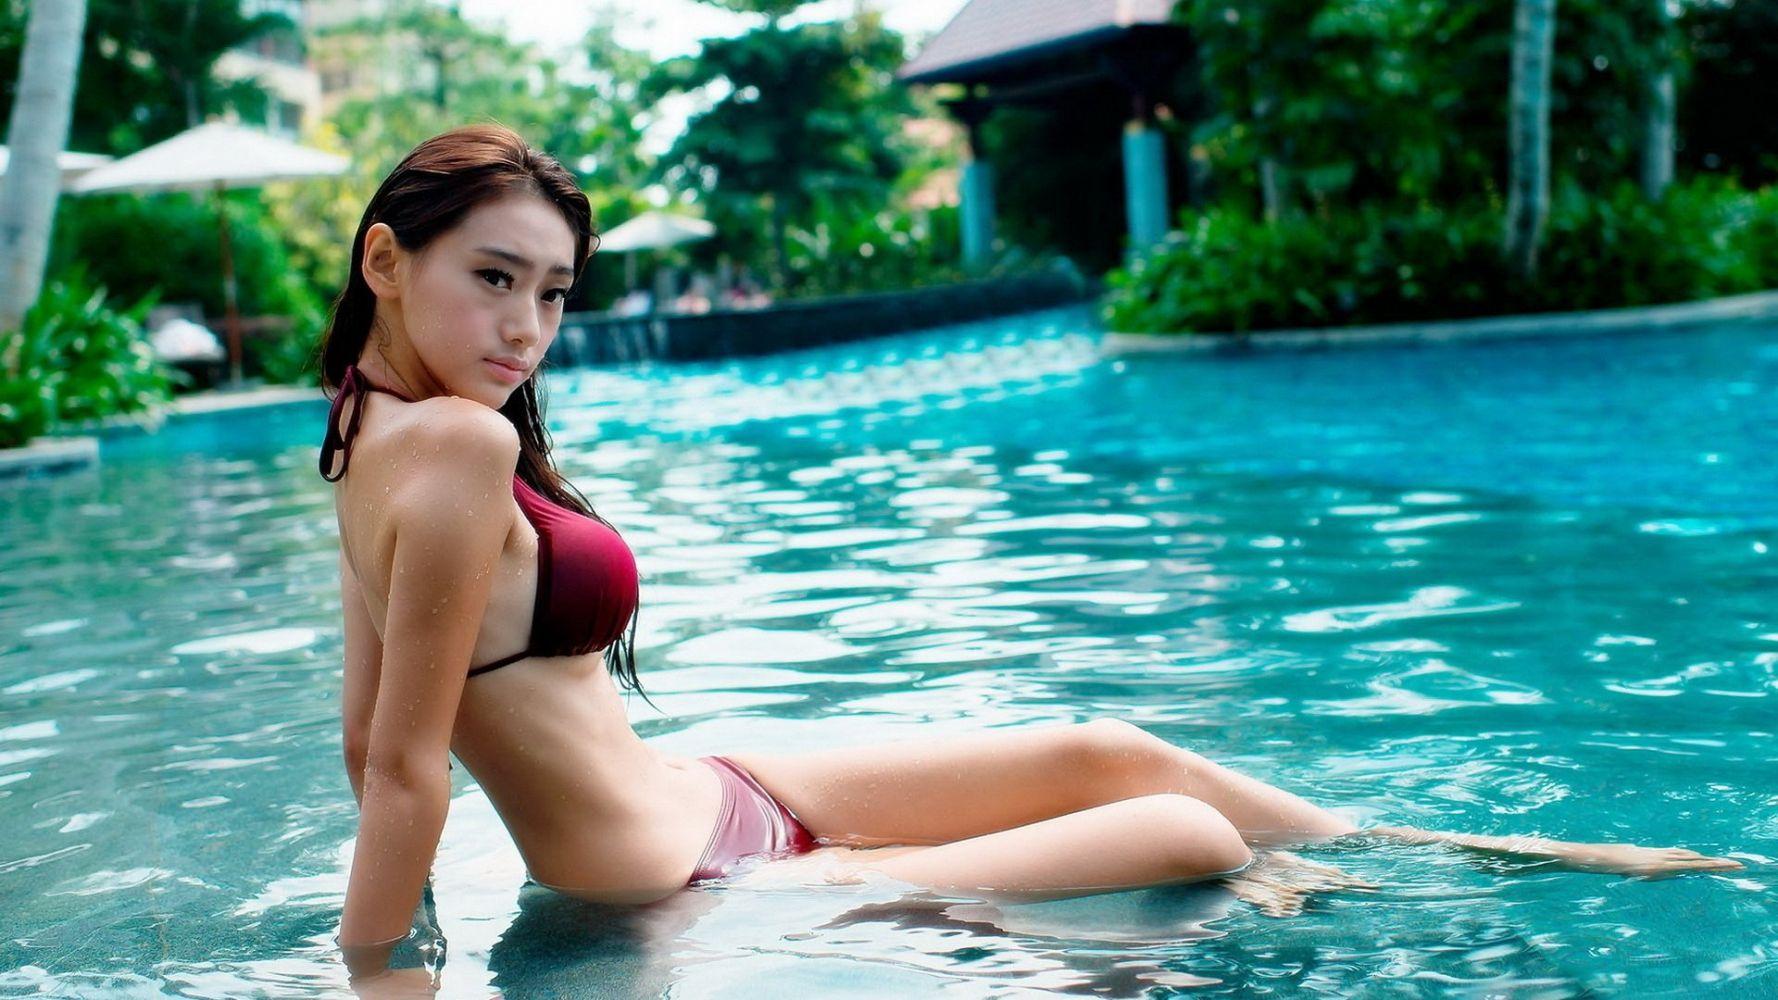 Japanese bikini girl wallpapers, sex bbs pics